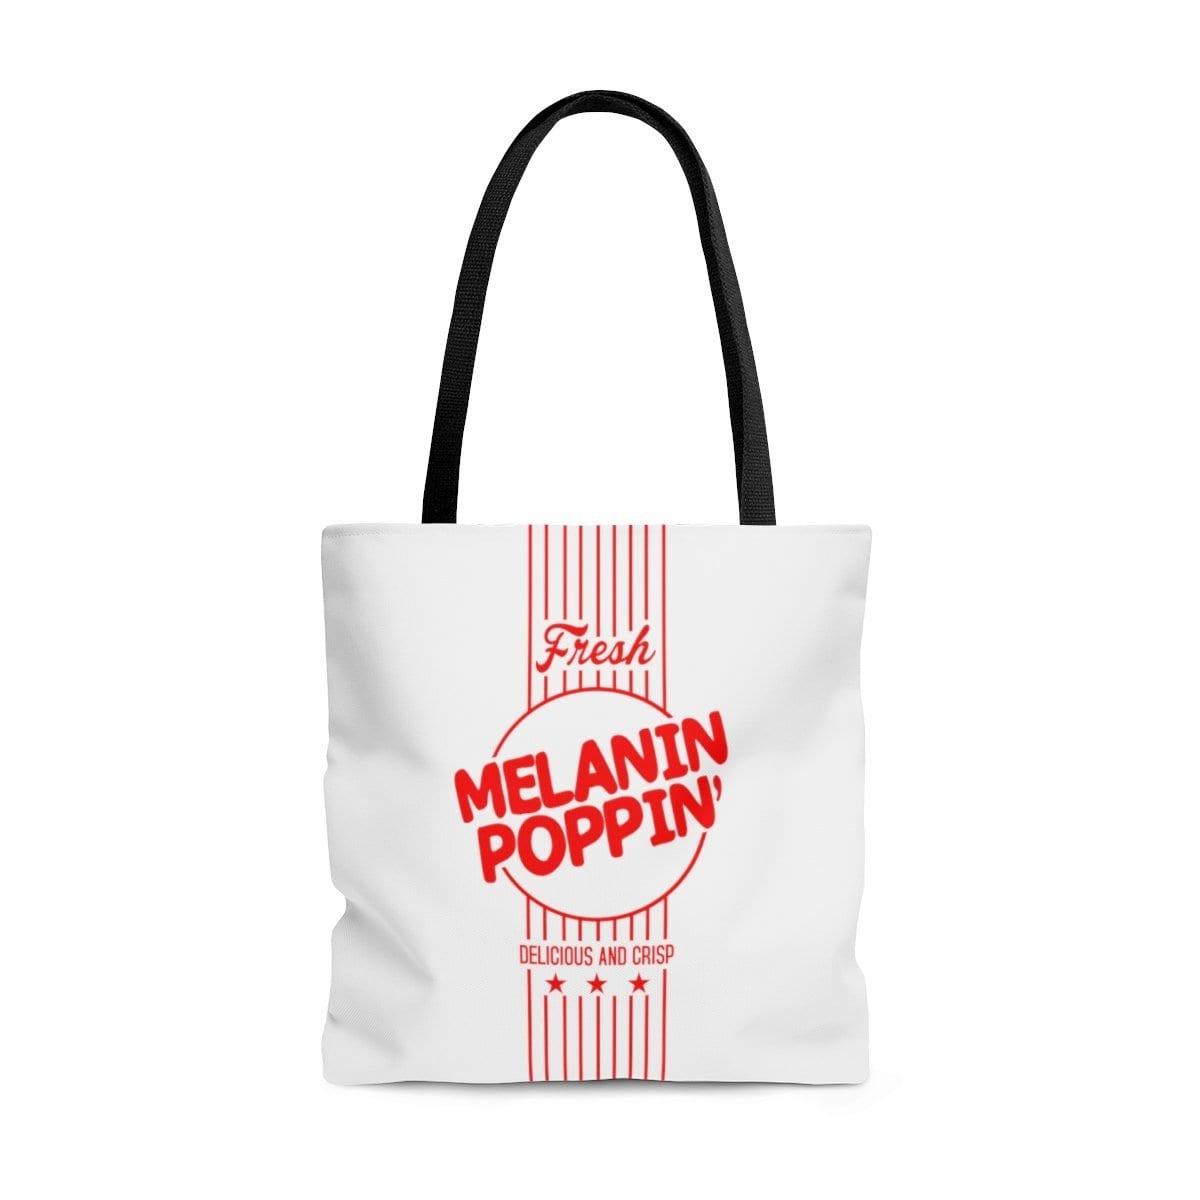 MELANIN POPPIN' TOTE BAG - Melanin Apparel